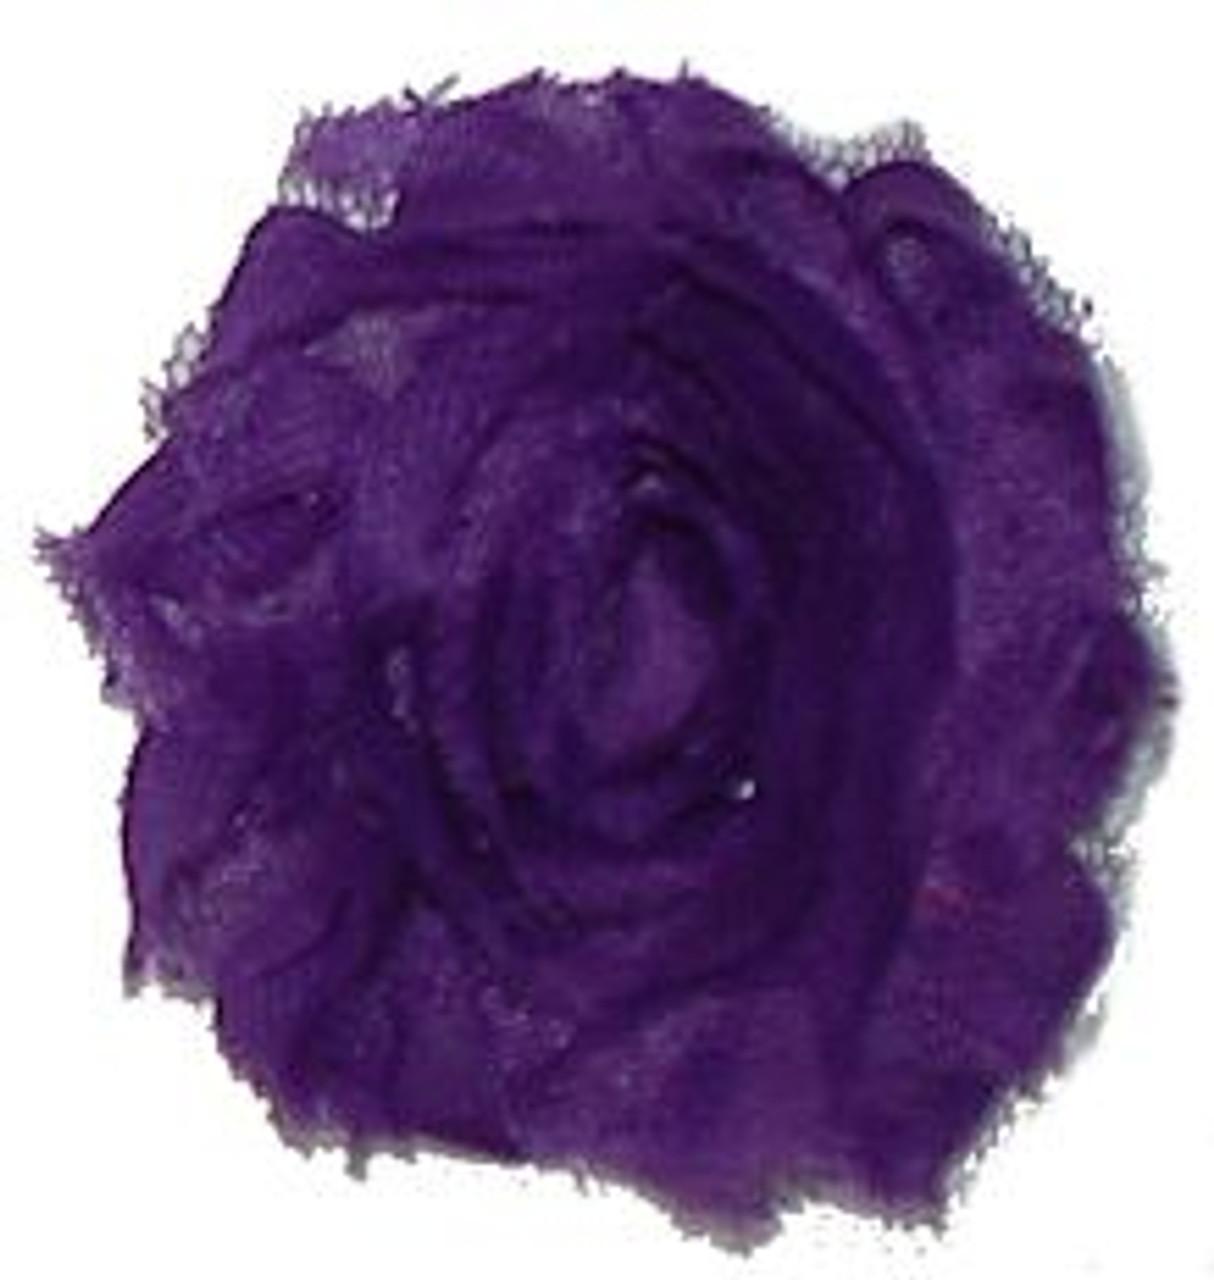 Purple shabby chiffon flowers for headbands and crafts